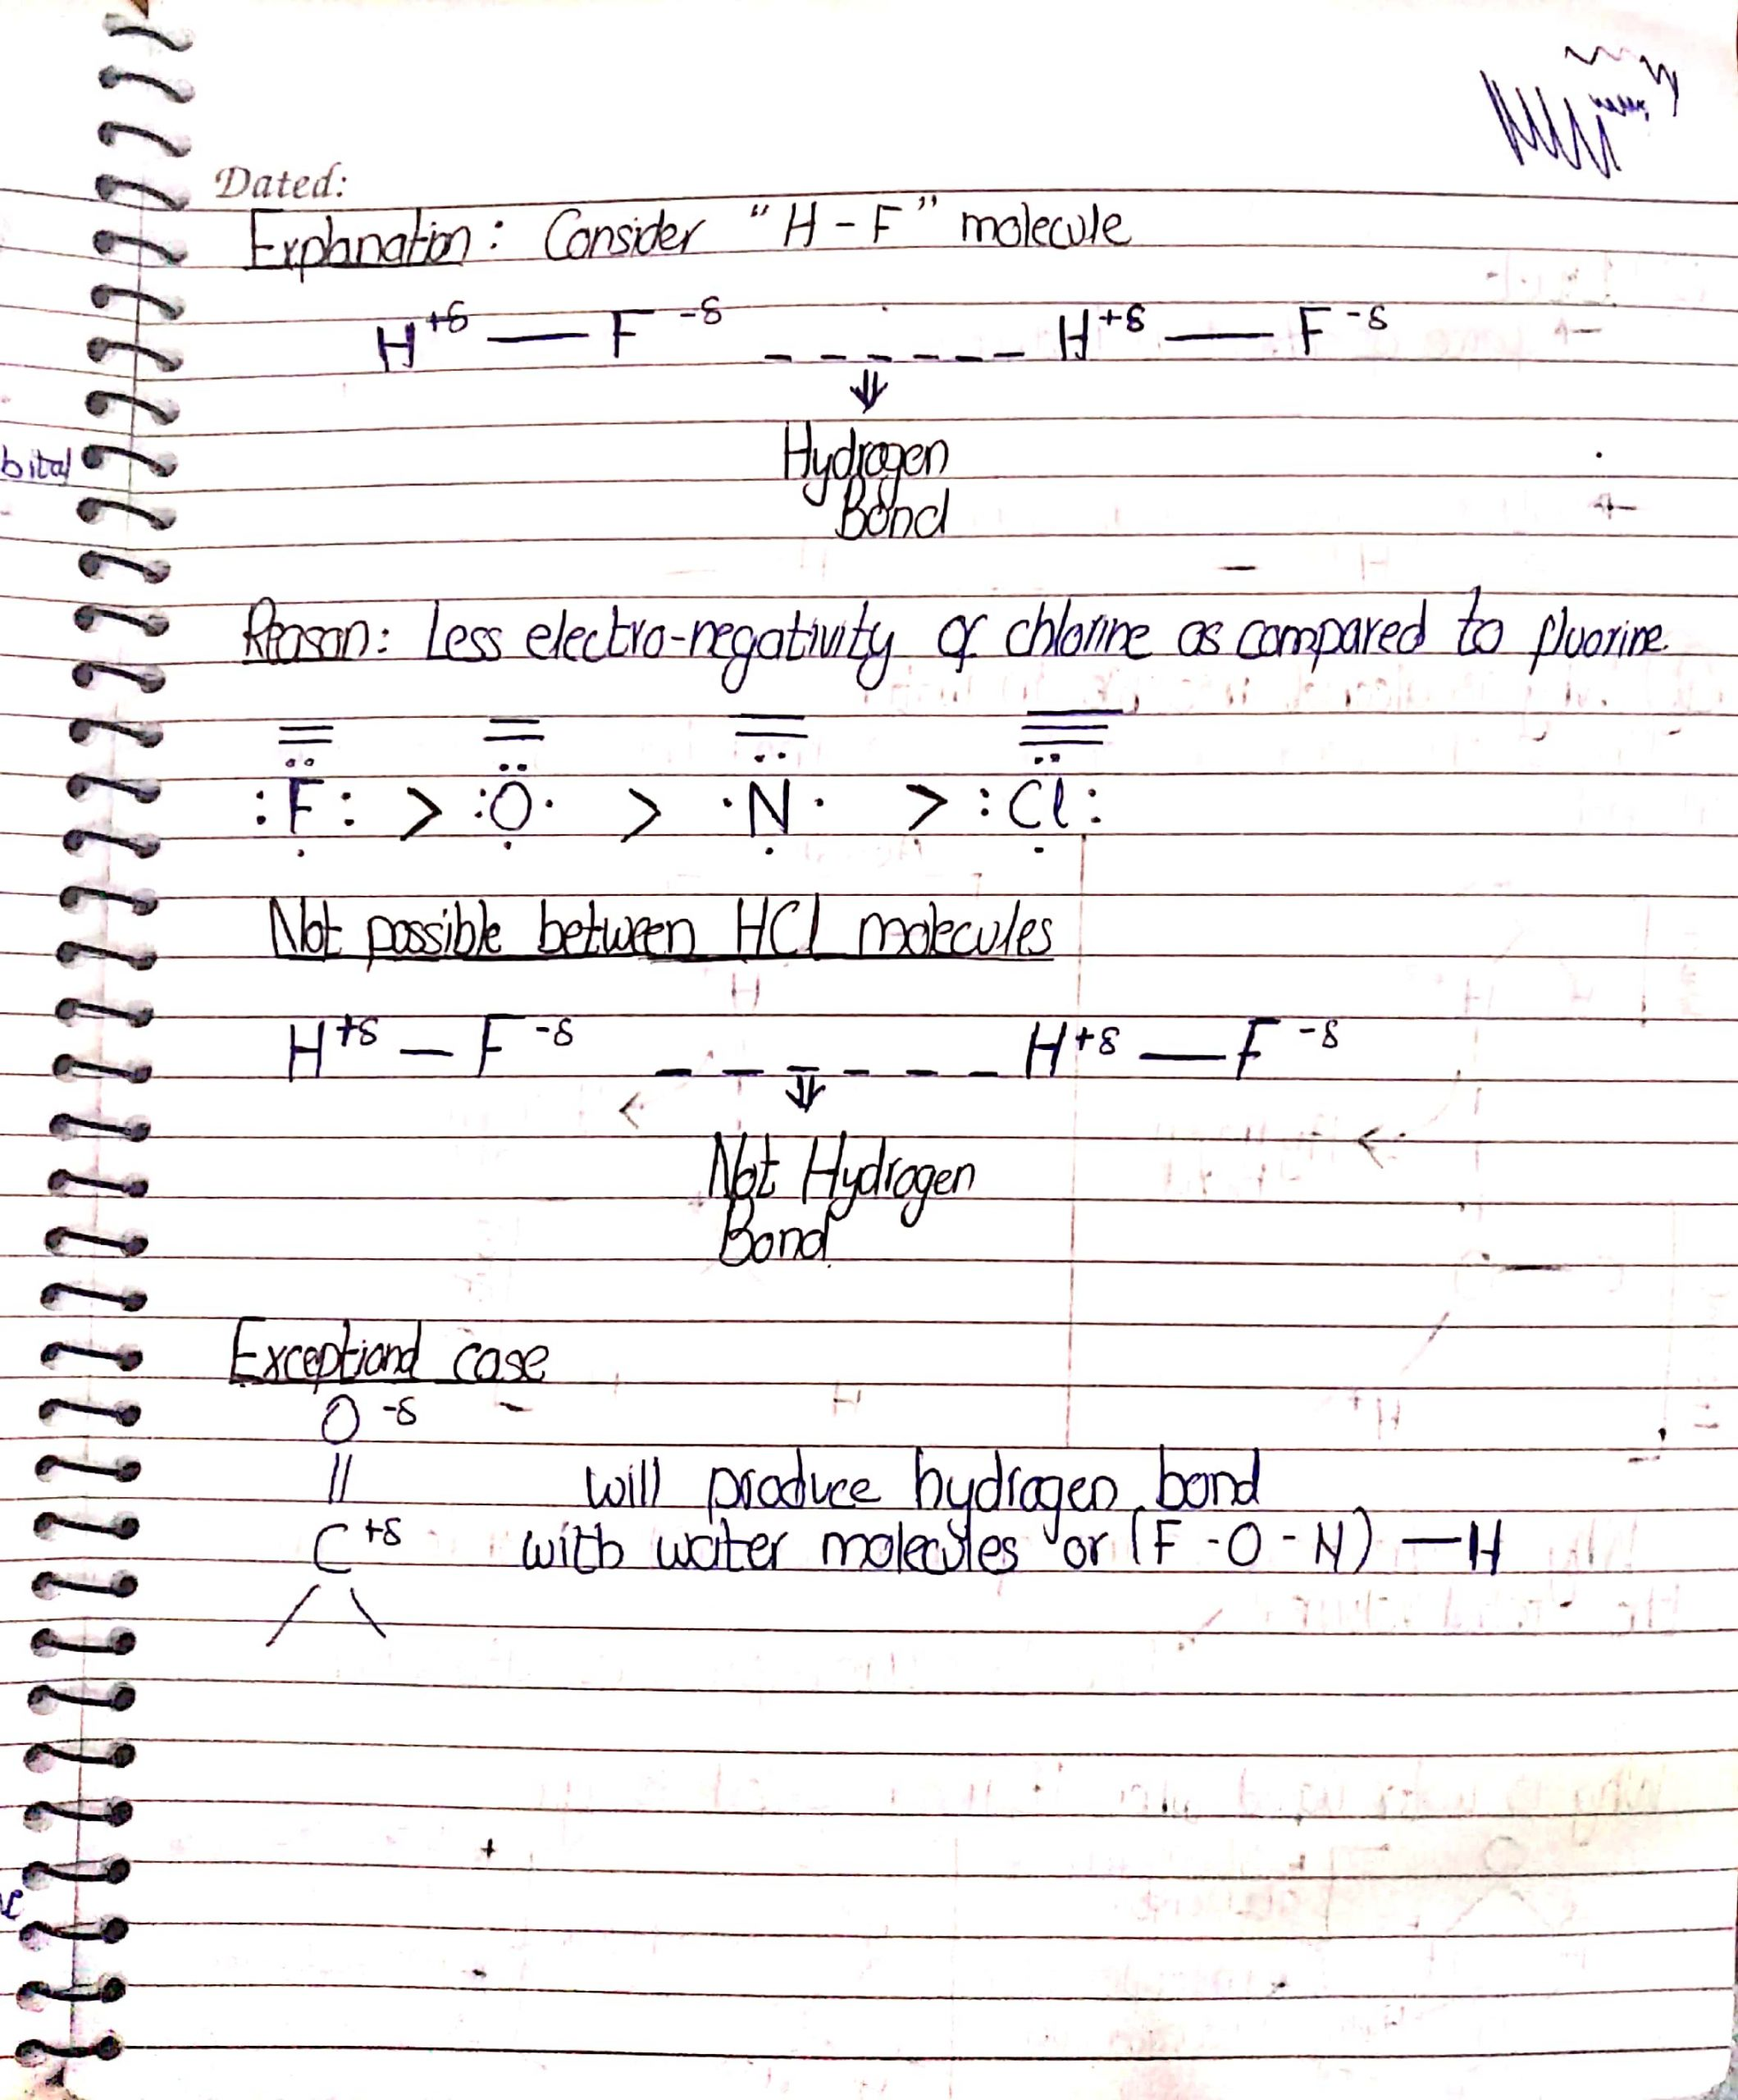 chemical bonding Sir Kashif_16